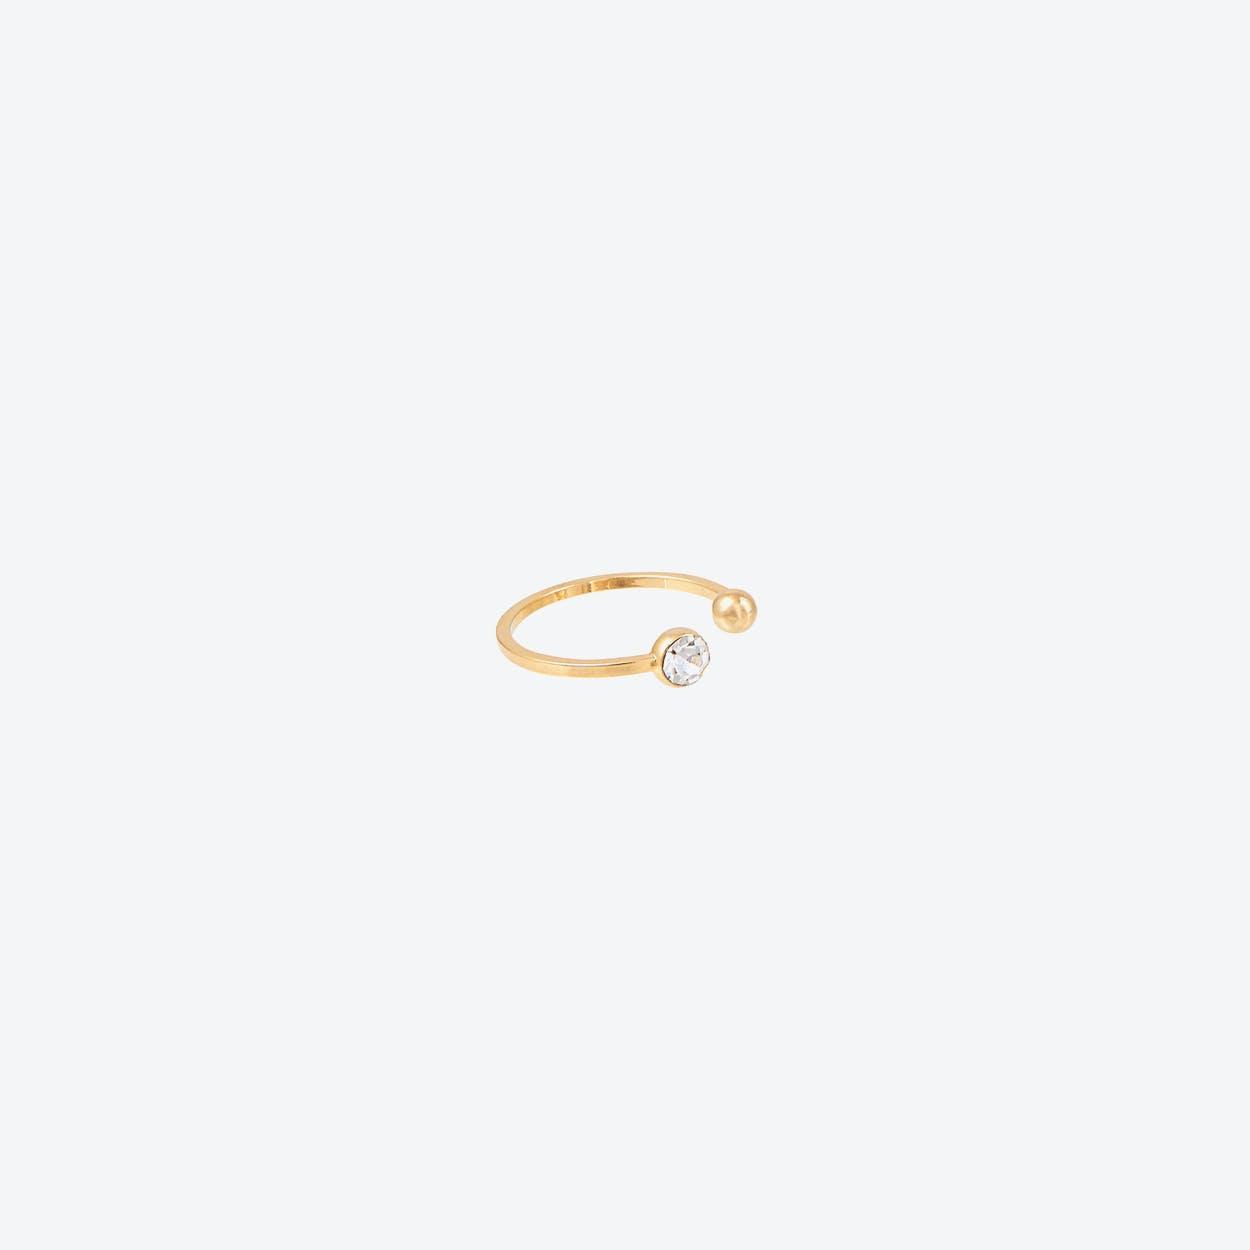 White Gold Half Disc Pendant